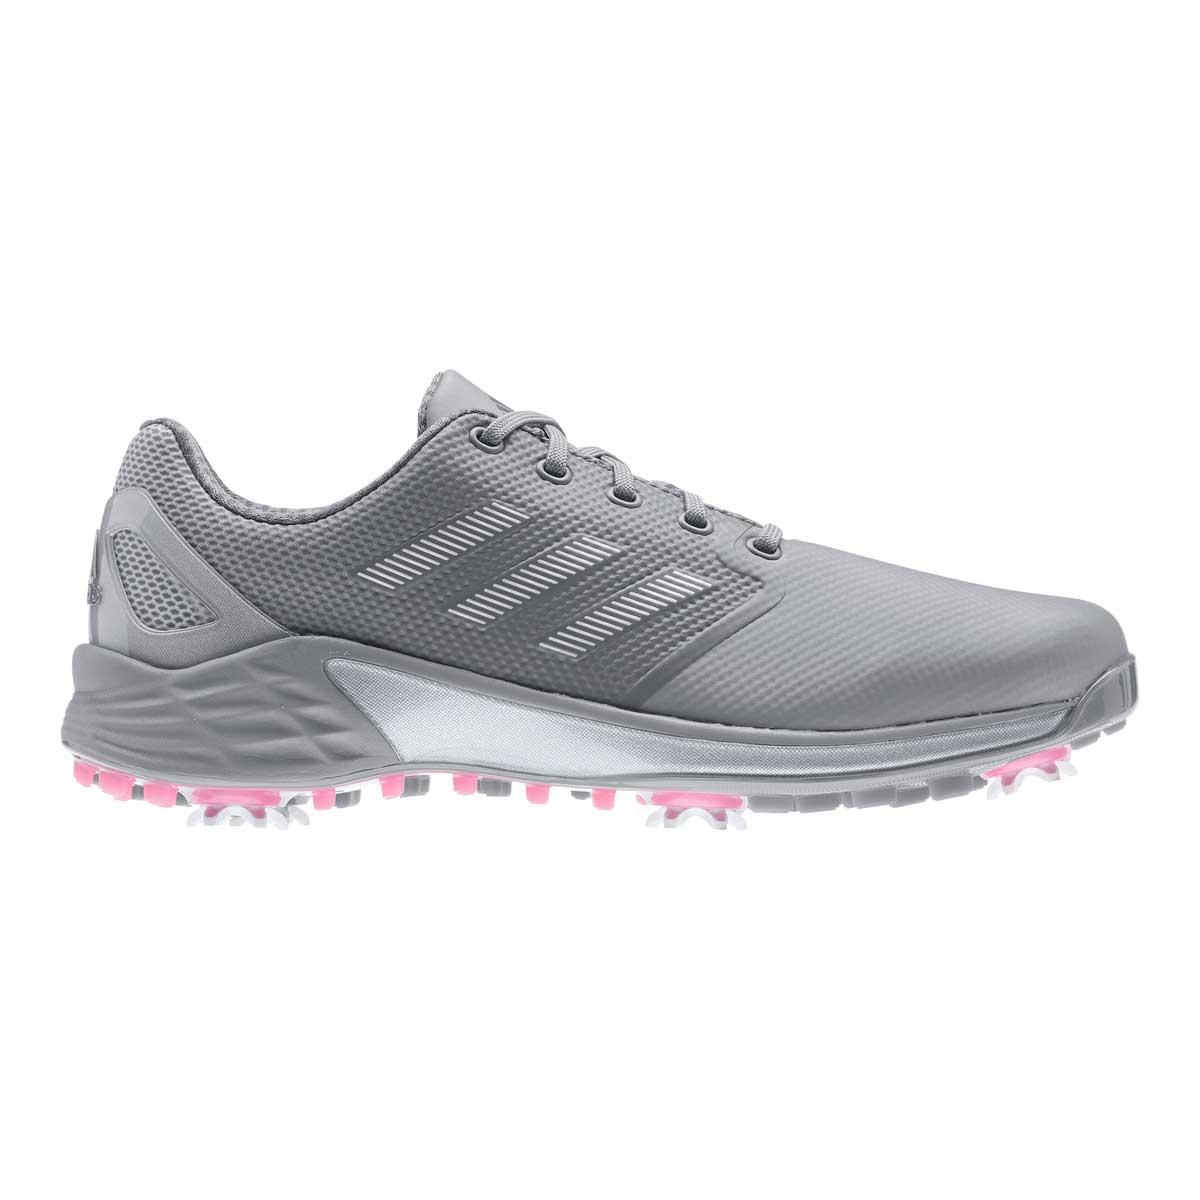 Adidas Men's ZG21 Grey/Silver Golf Shoe